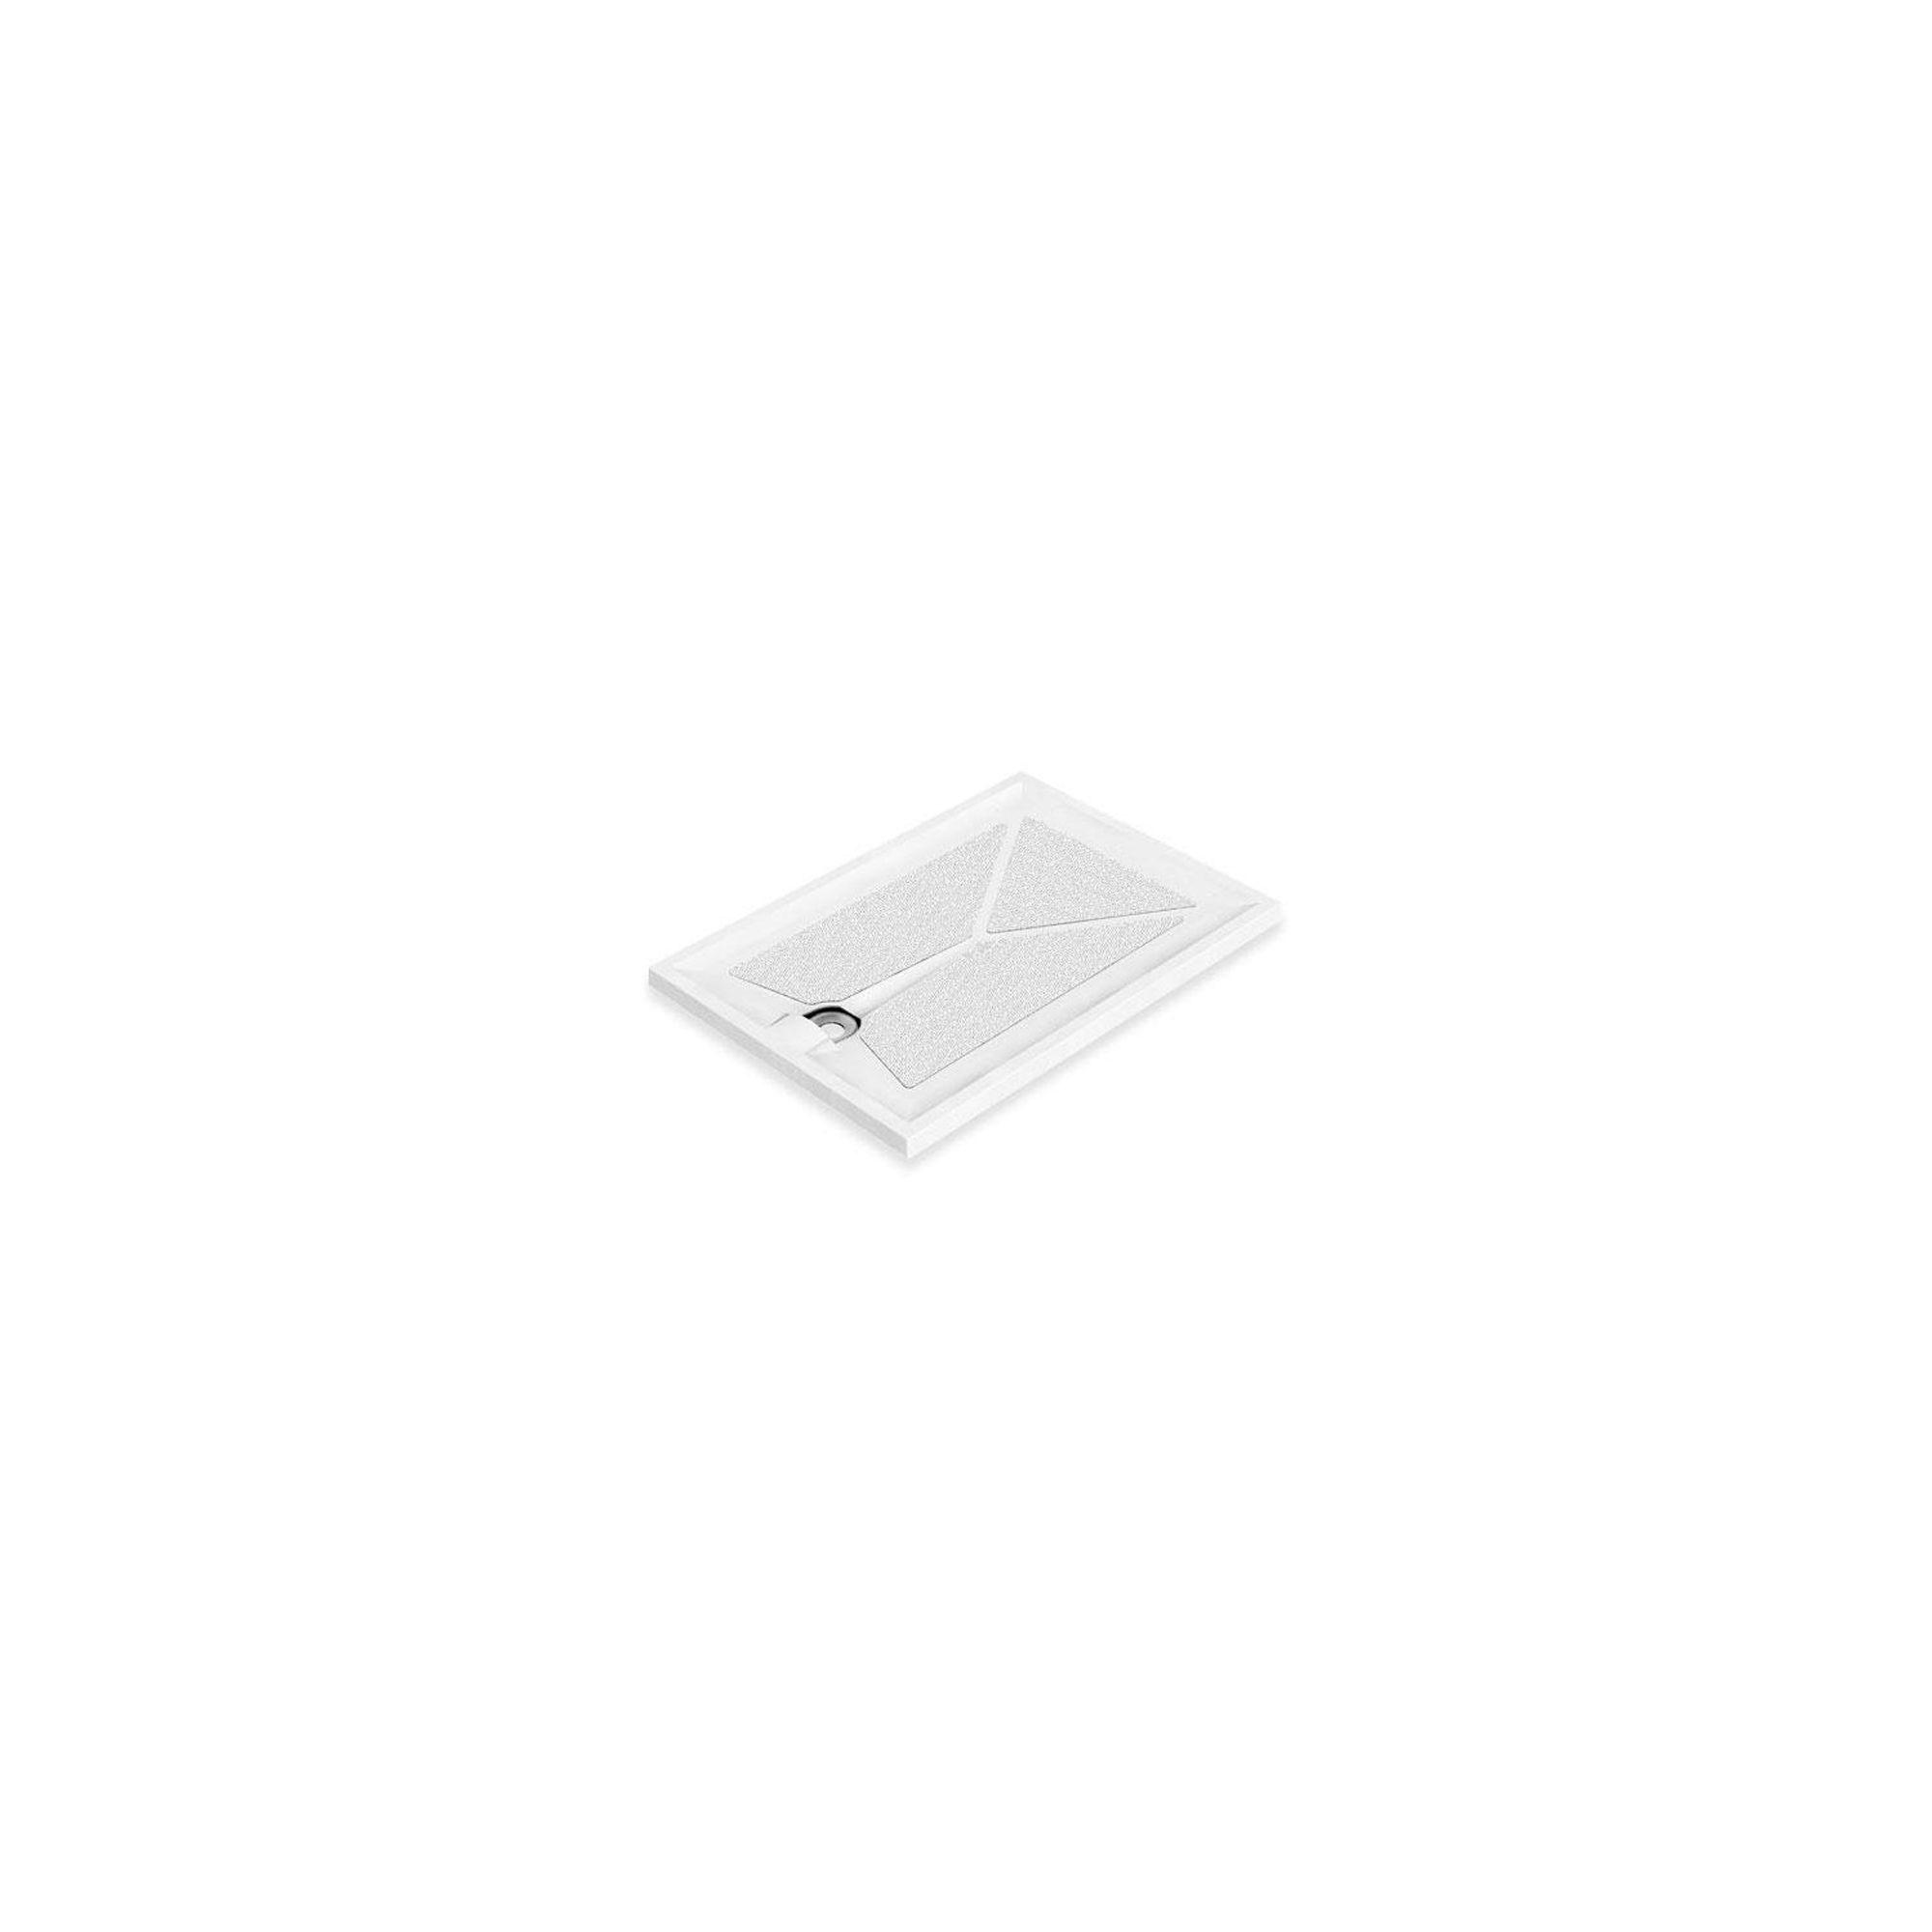 AKW Braddan Rectangular Shower Tray 1500mm x 700mm at Tesco Direct